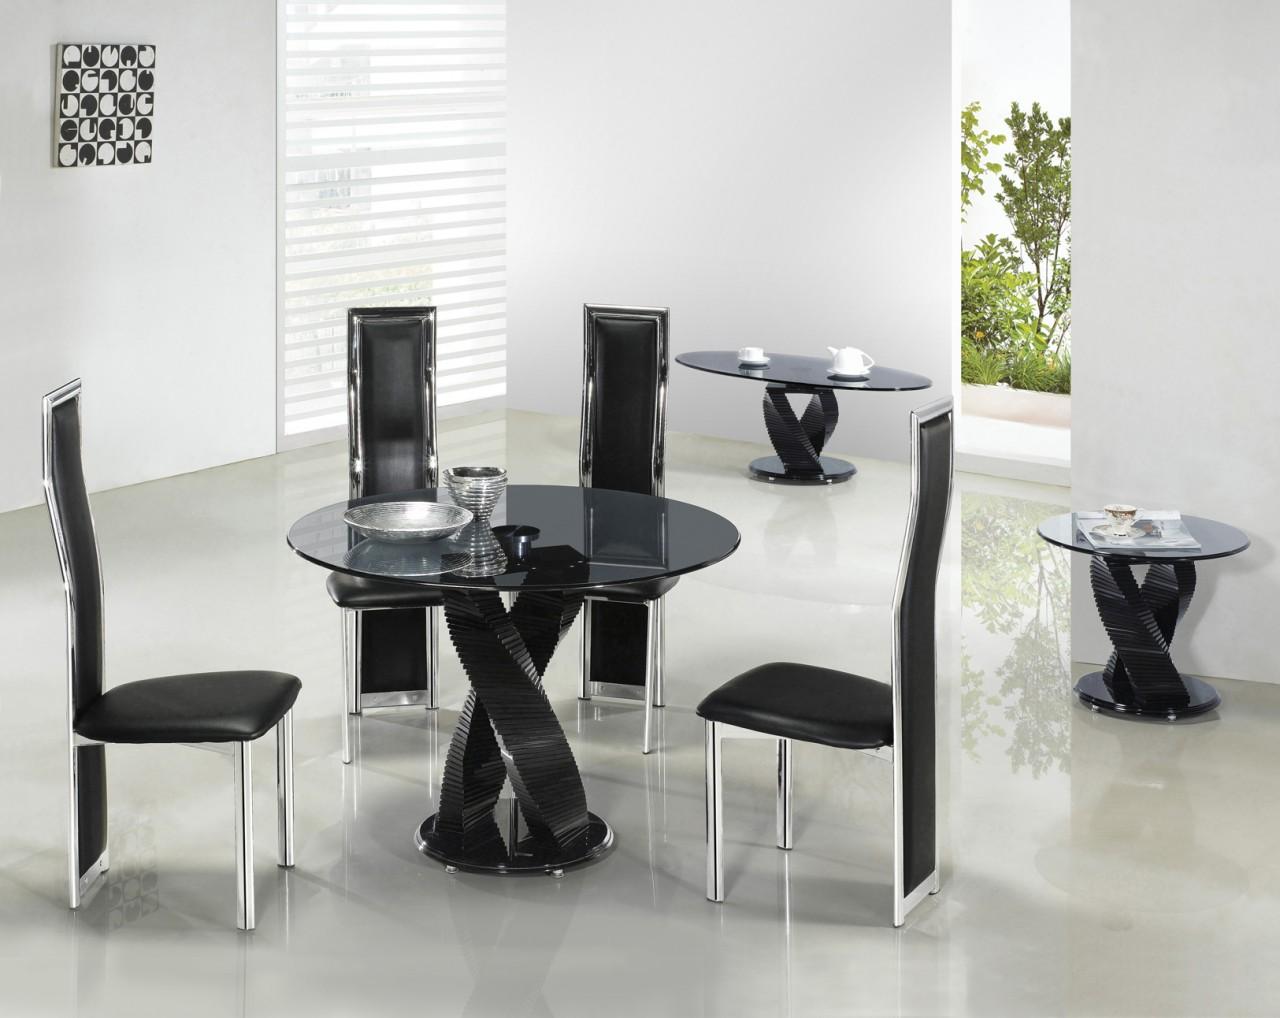 Black And Silver Furniture 33 Widescreen Wallpaper